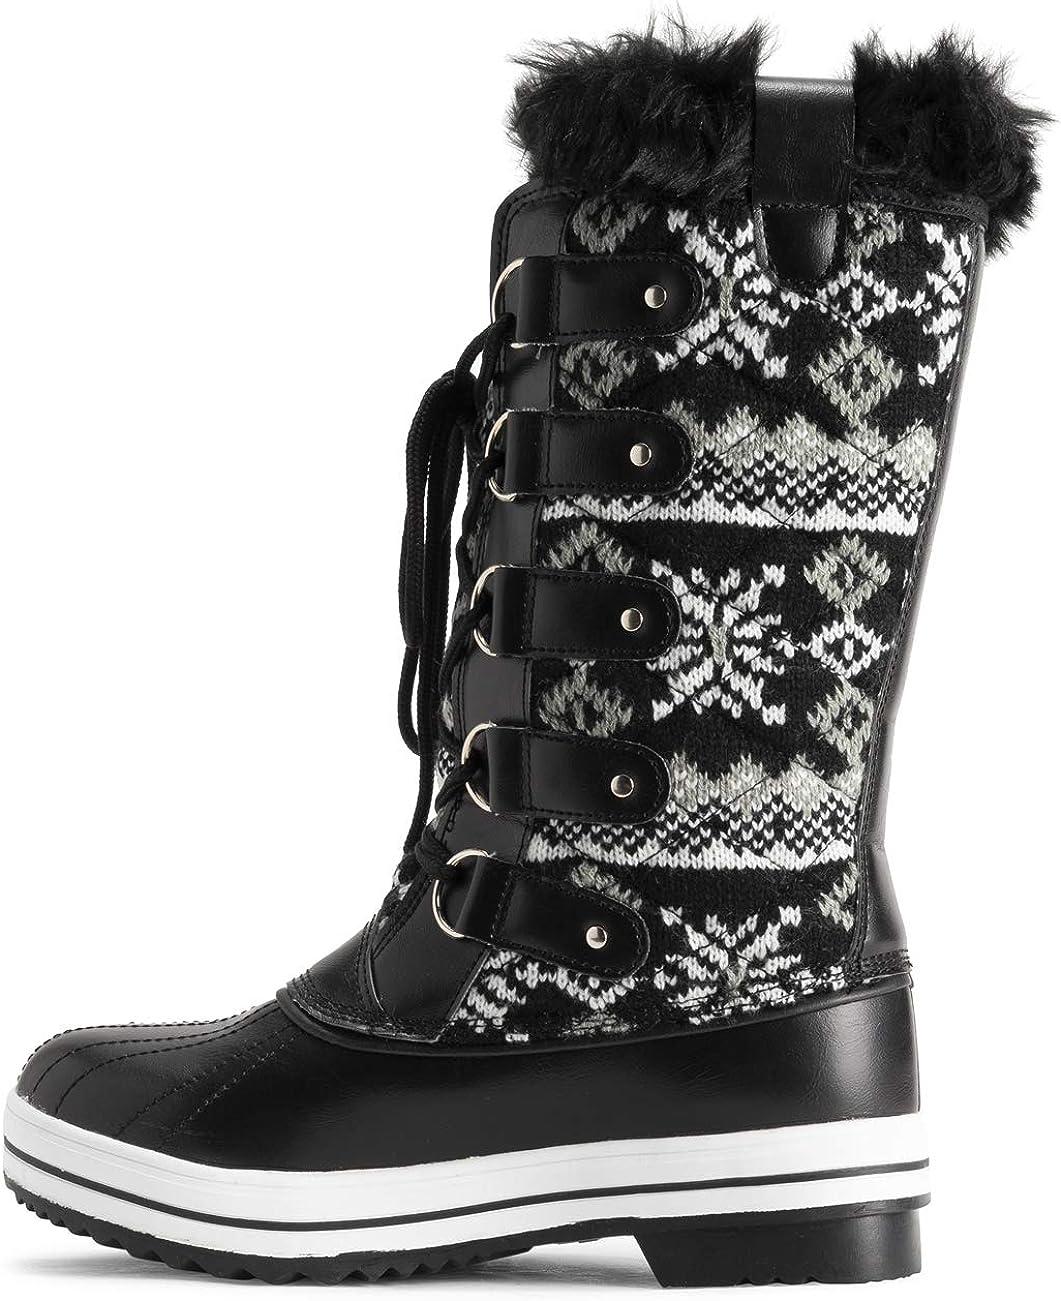 Polar Womens Nylon Tall Winter Snow Boot